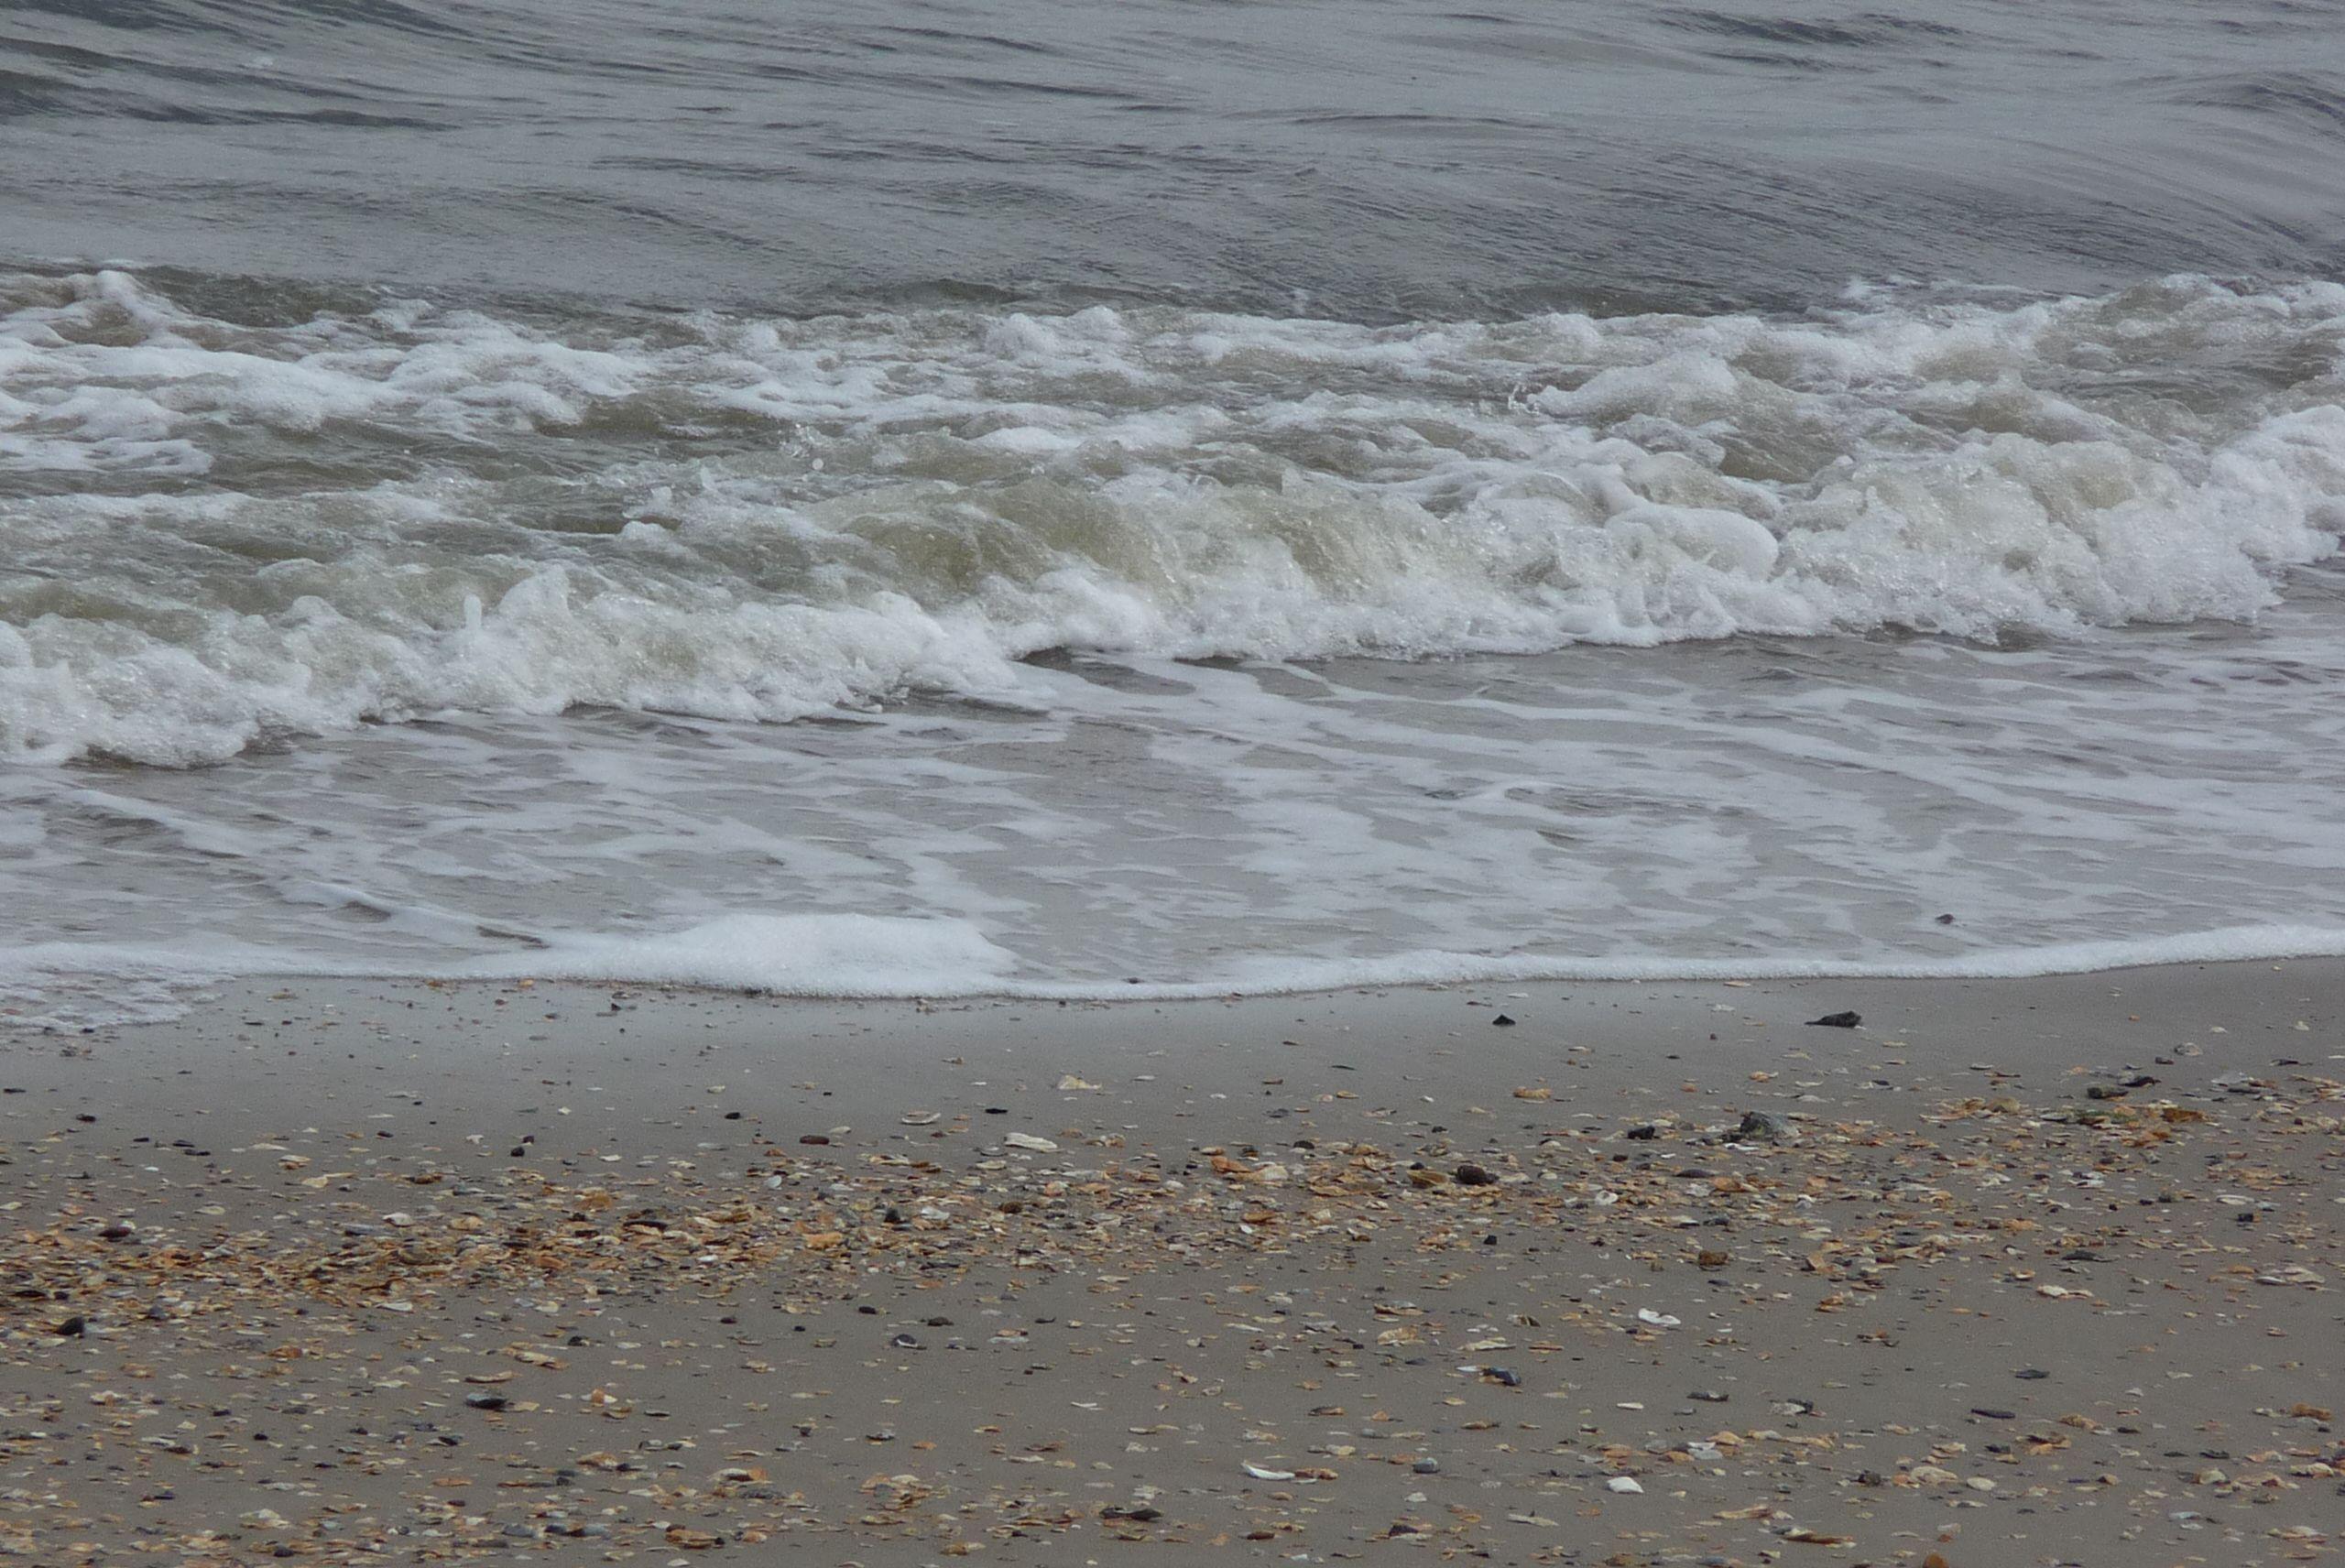 The Atlantic coming ashore in South Carolina